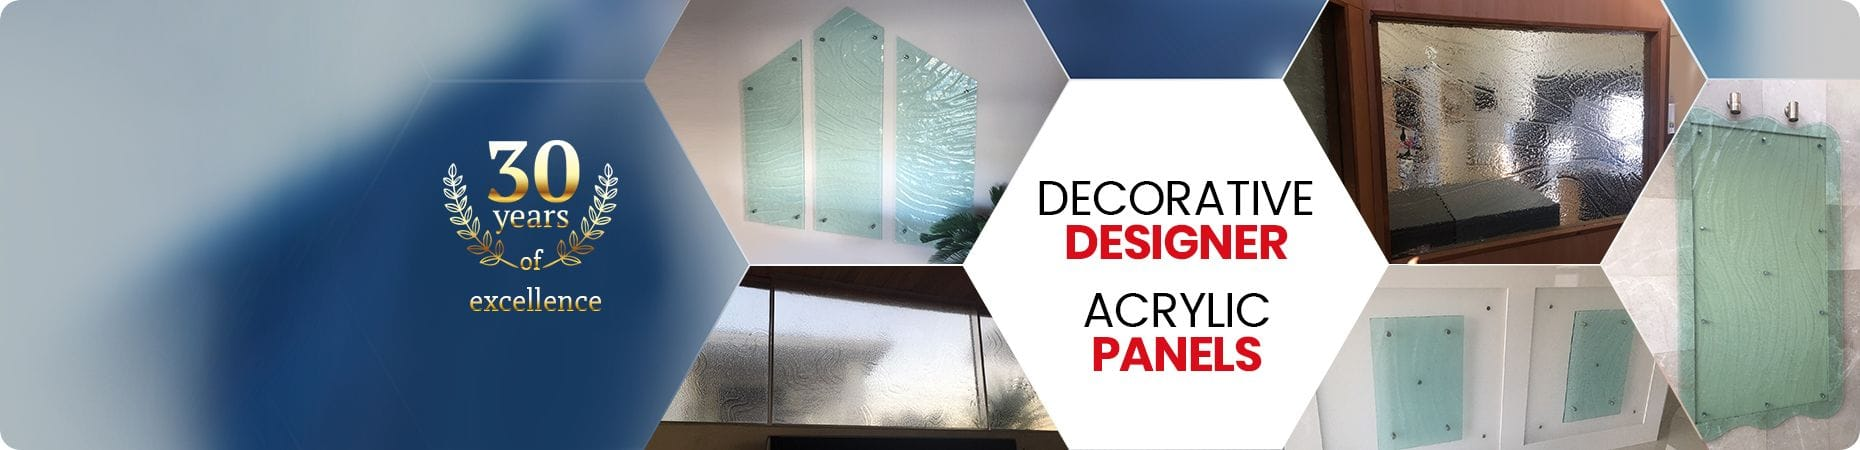 Decorative designer acrylic panels | Slumped acrylic | P & M Plastics